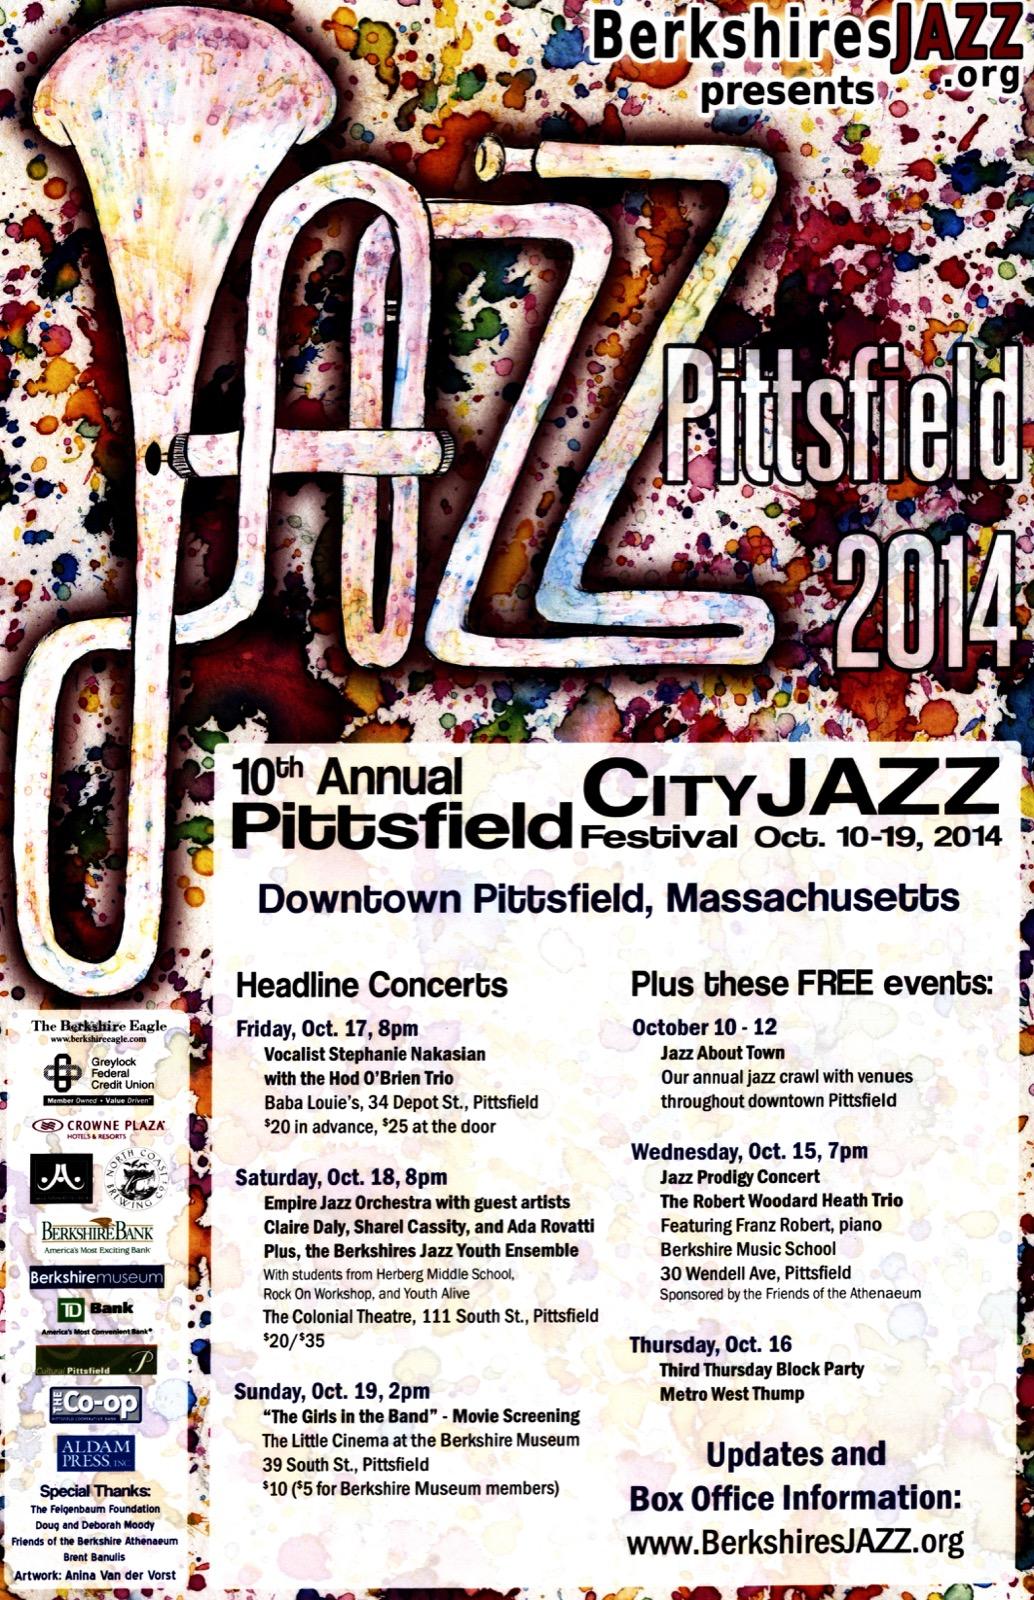 Pittsfield_City_Jazz_Fest_Oct10-19.jpg